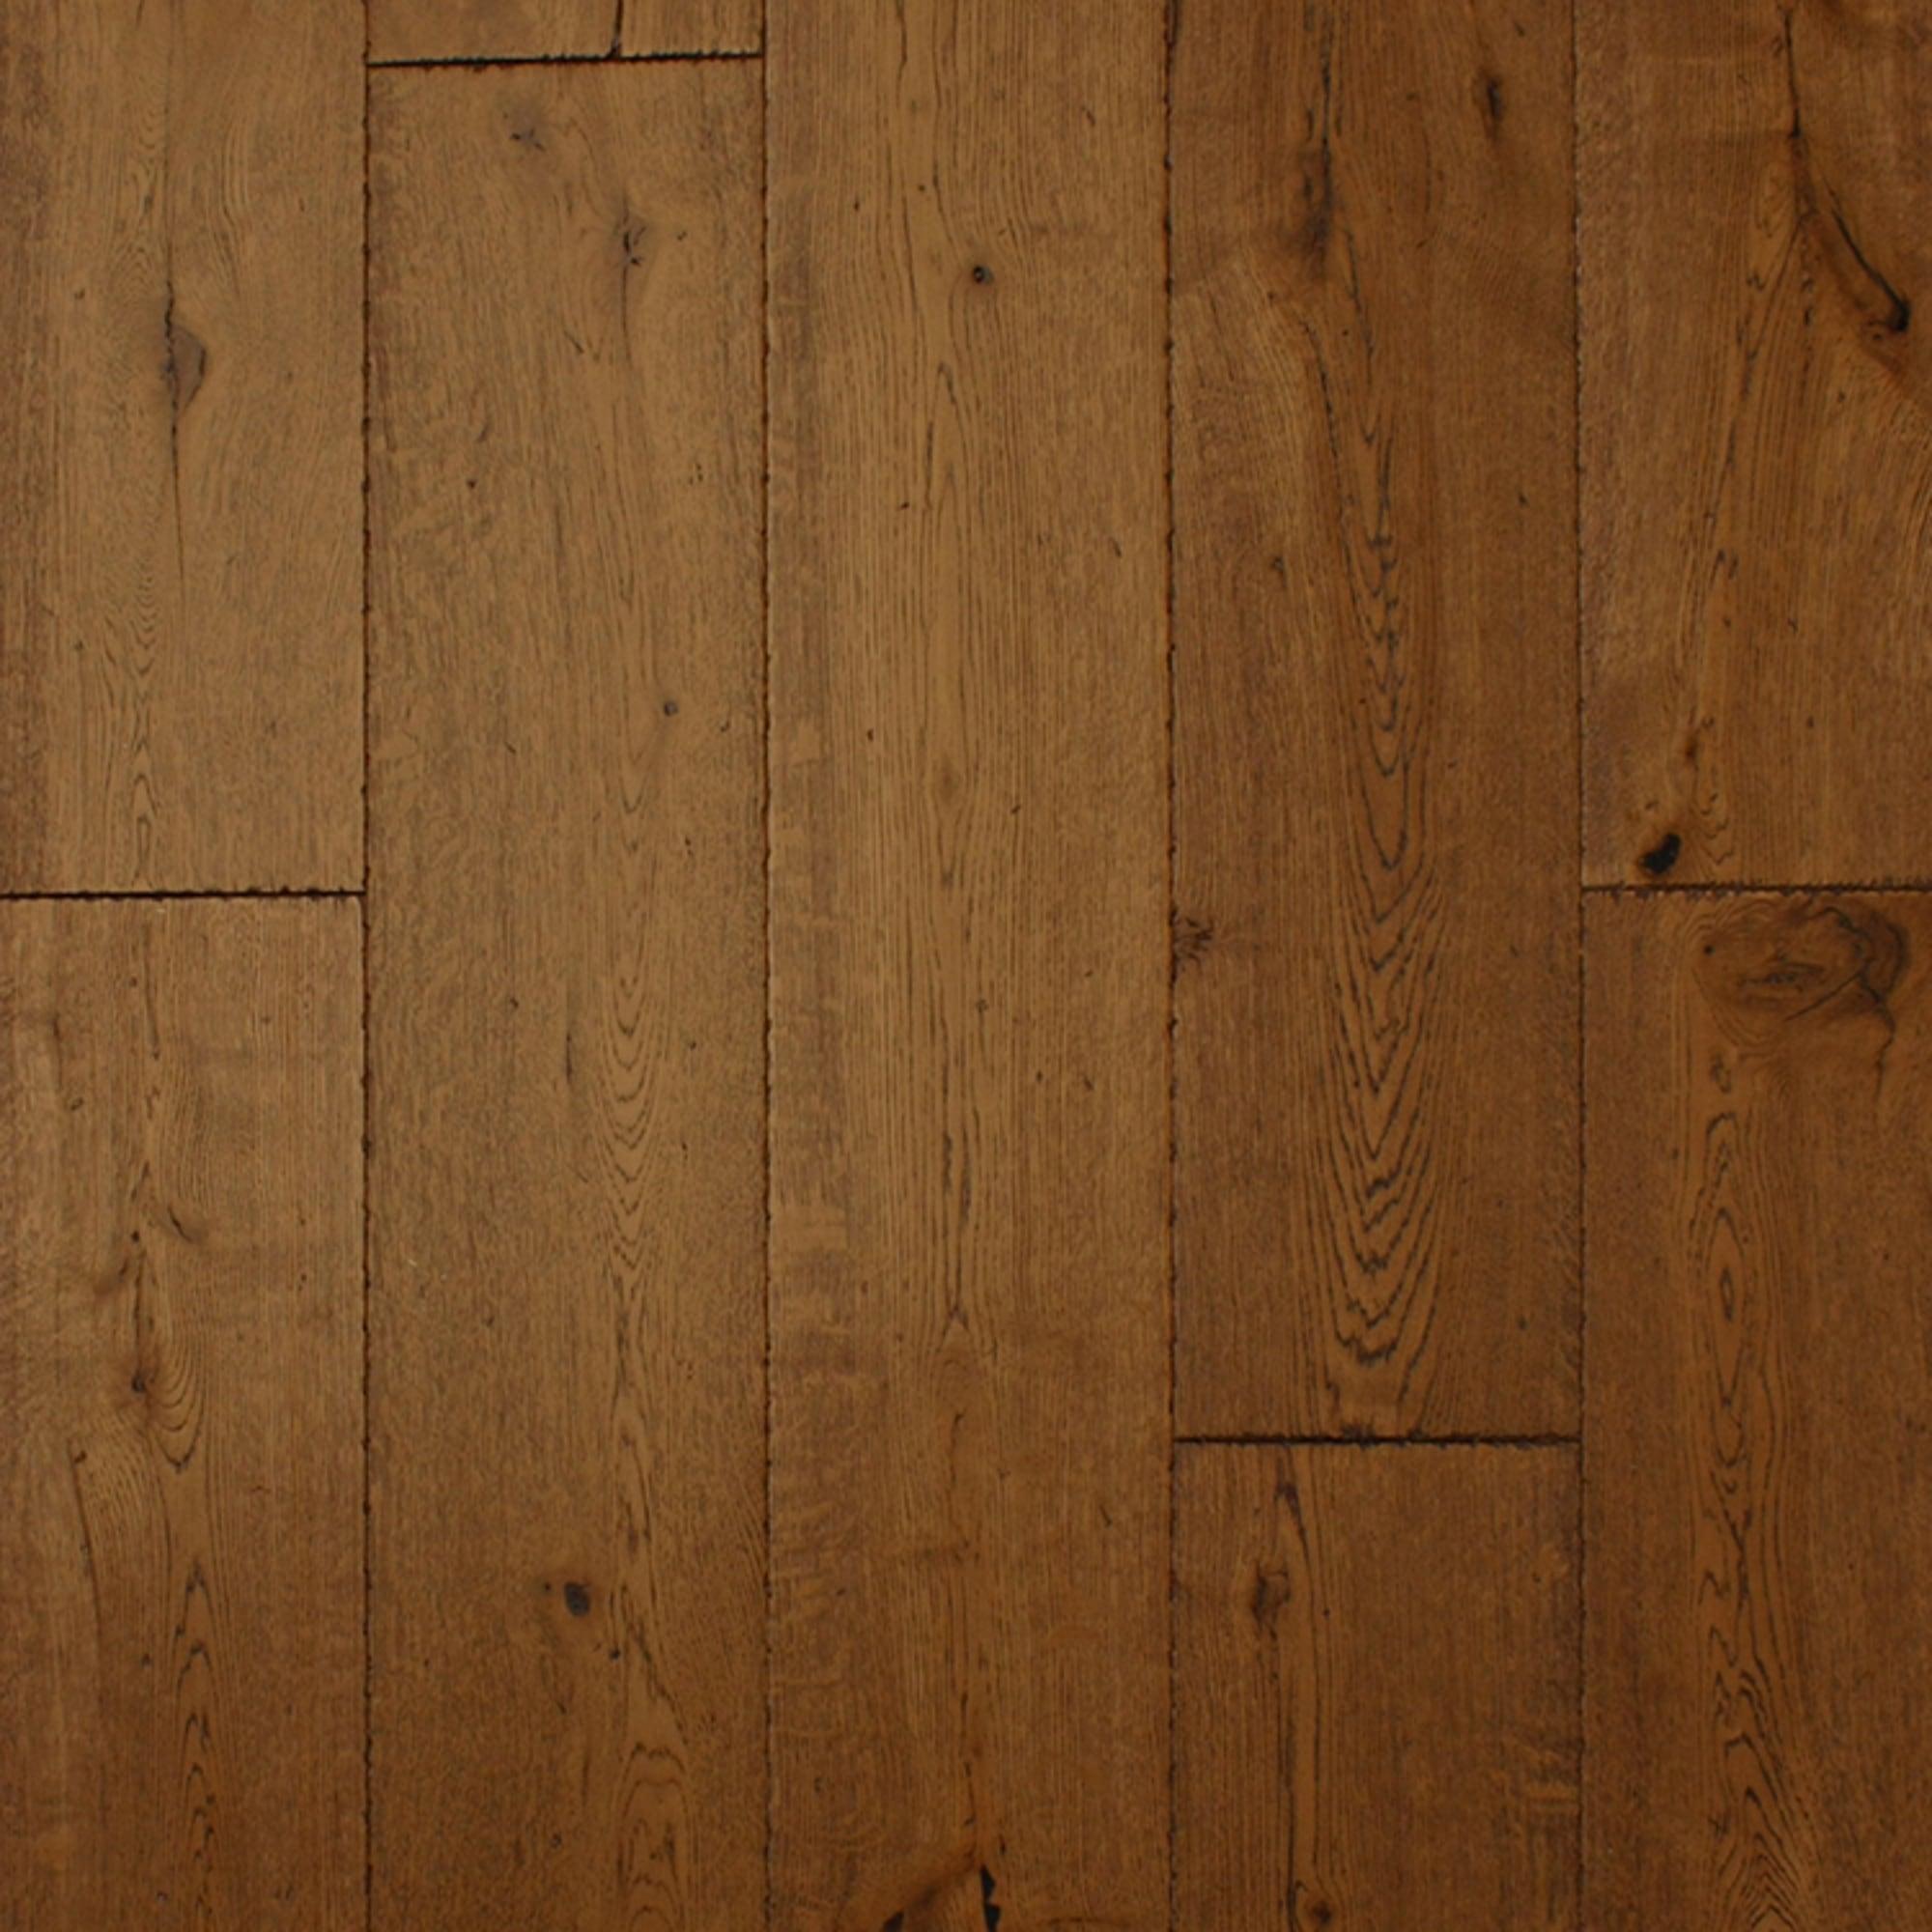 Wood flooring 18x189mm hand worn antique tumbled edge Worn wood floors